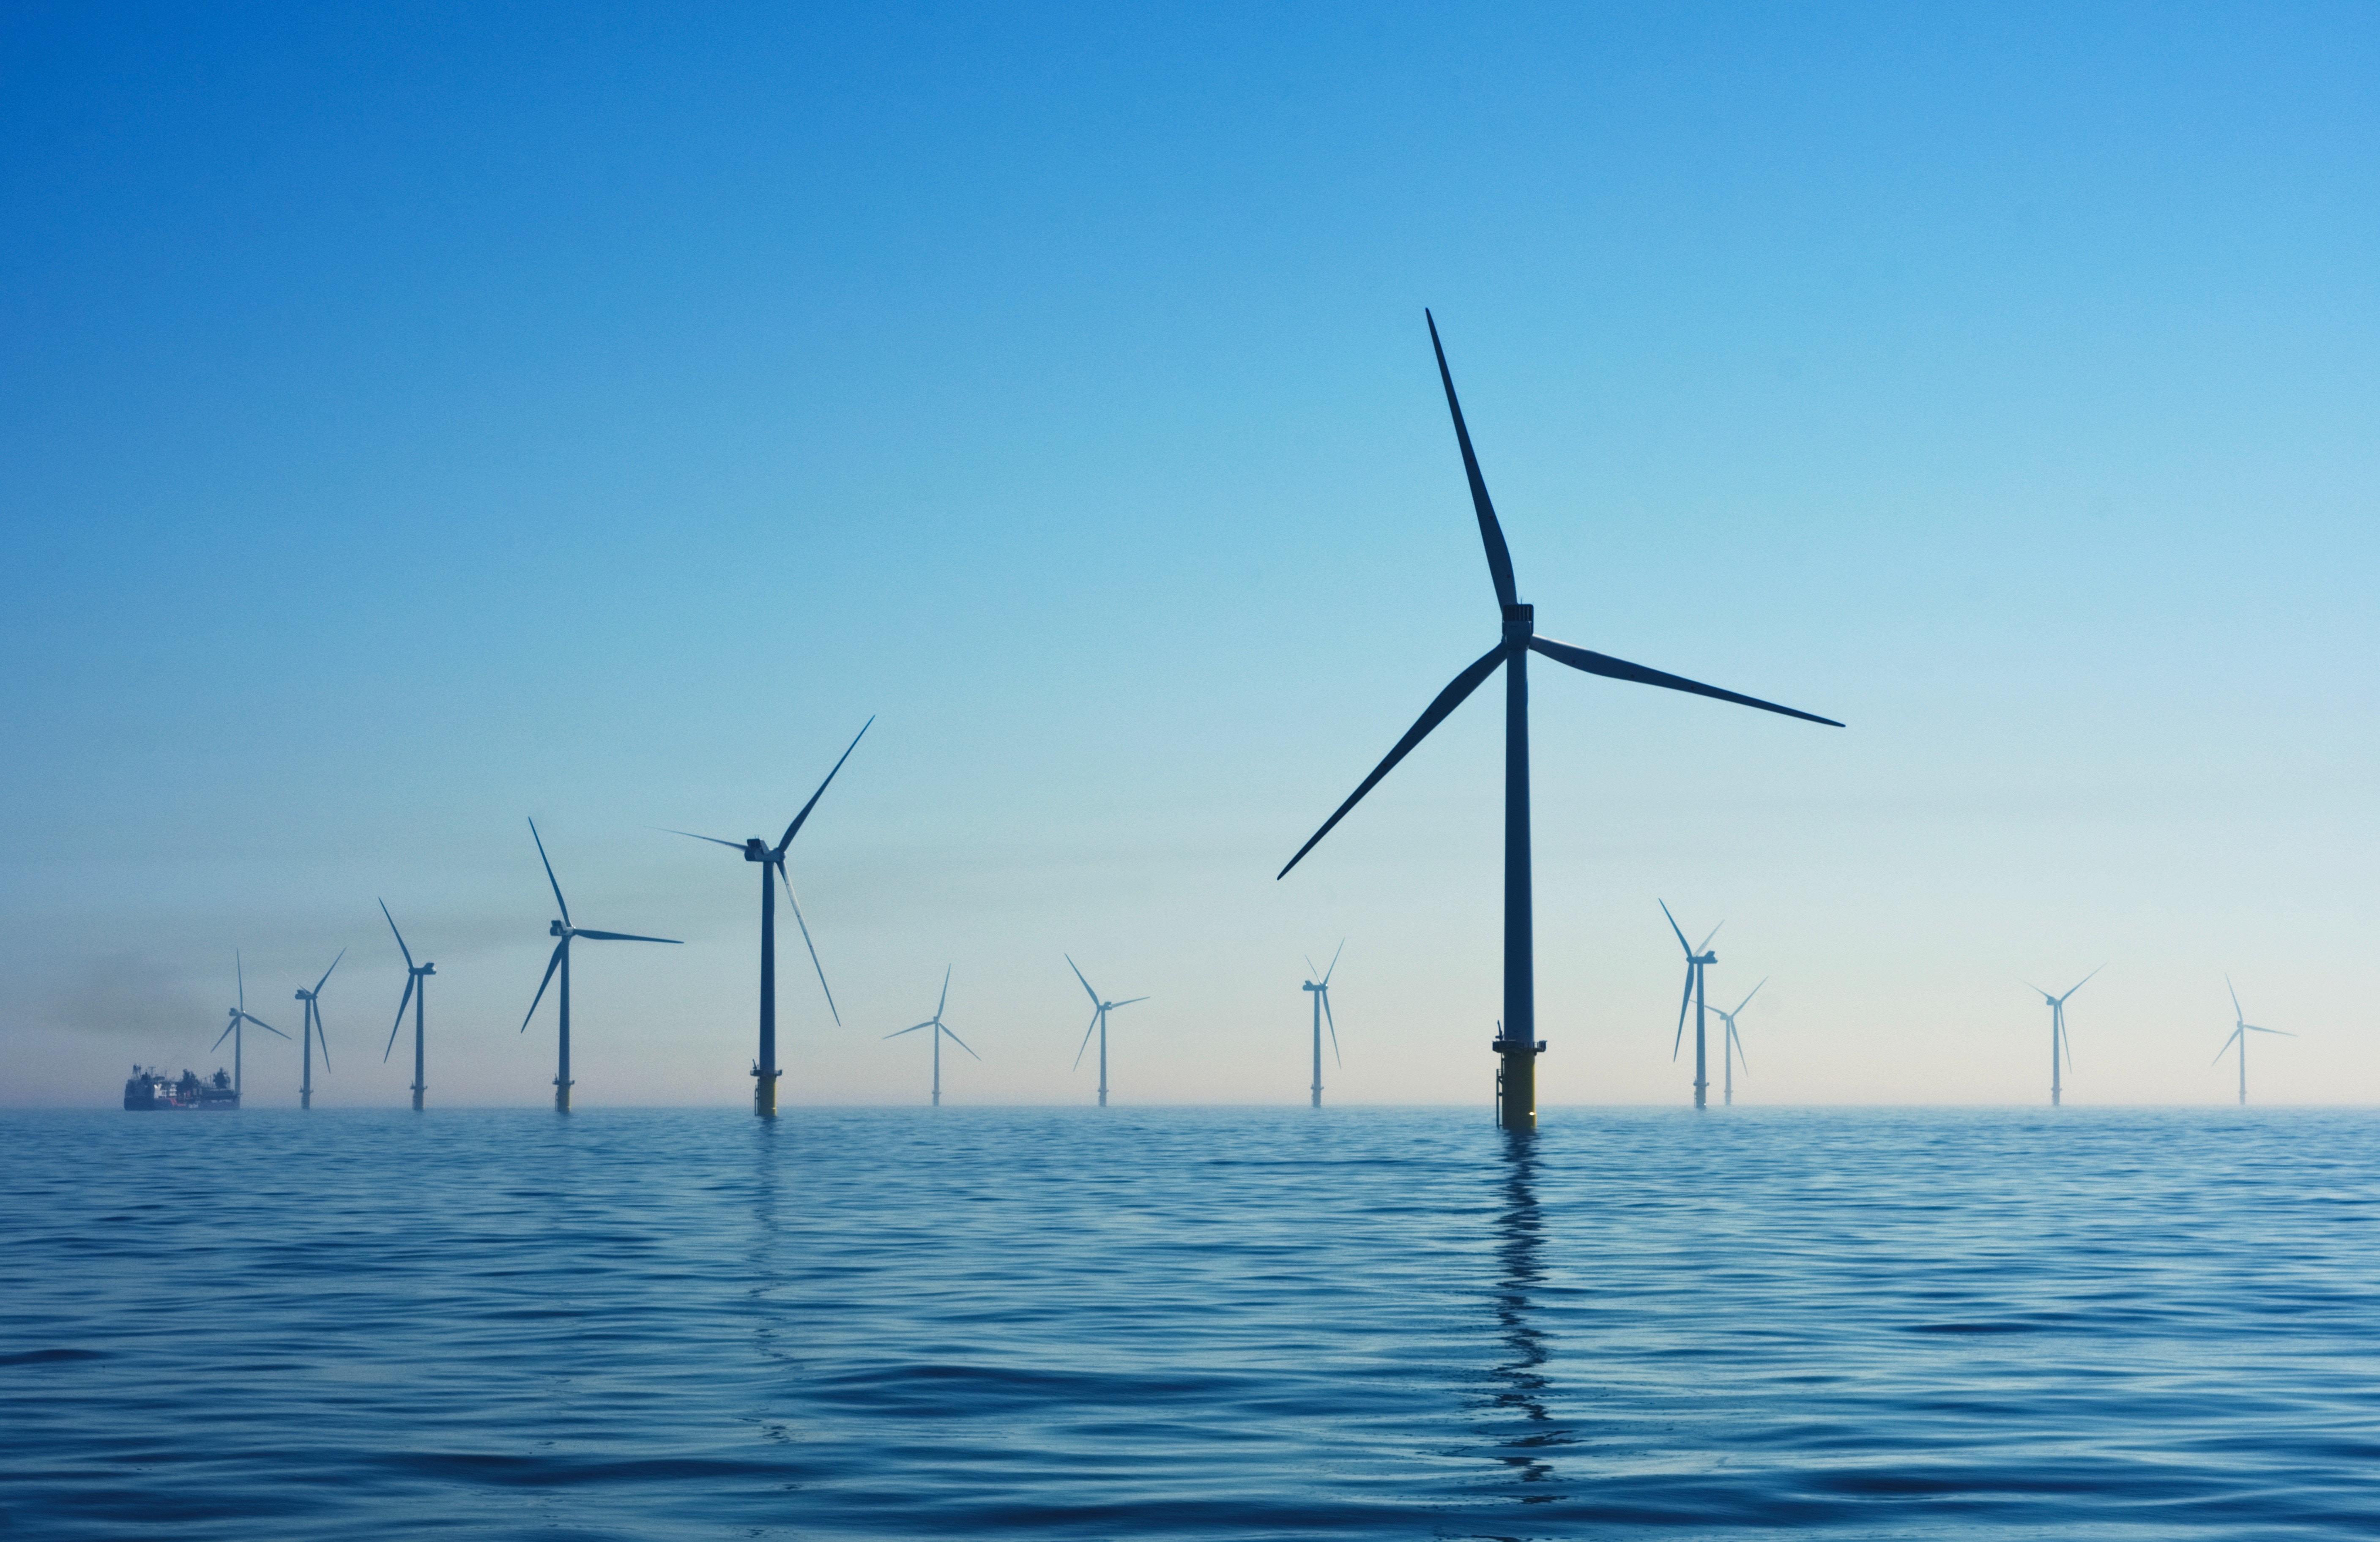 Offshore wind deployment